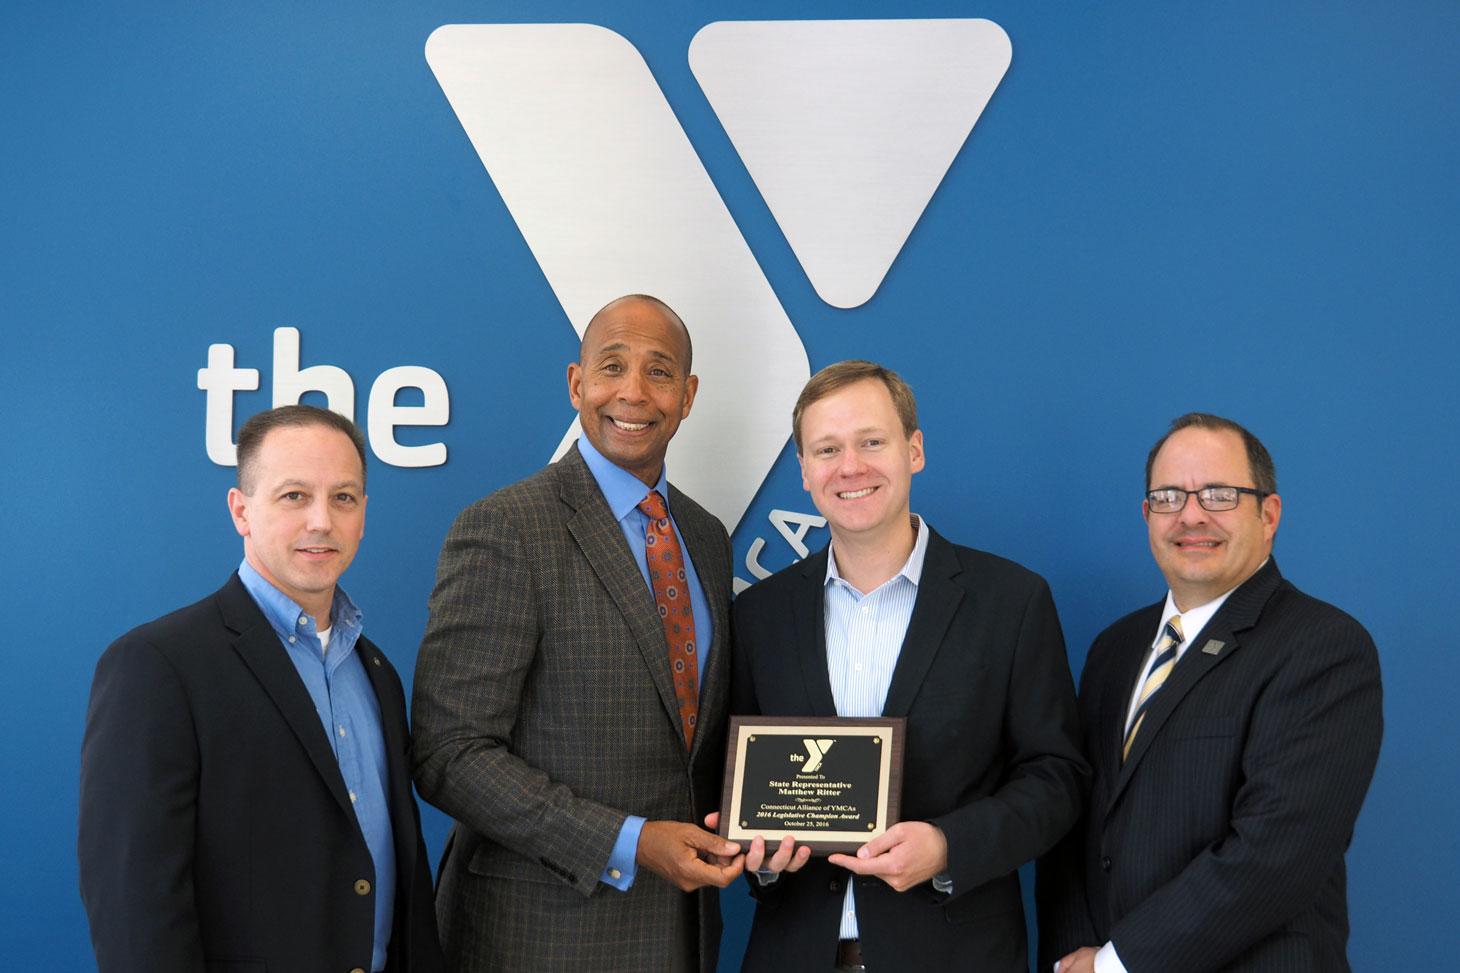 Rep. Ritter Receives the 2016 Legislative Champion Award